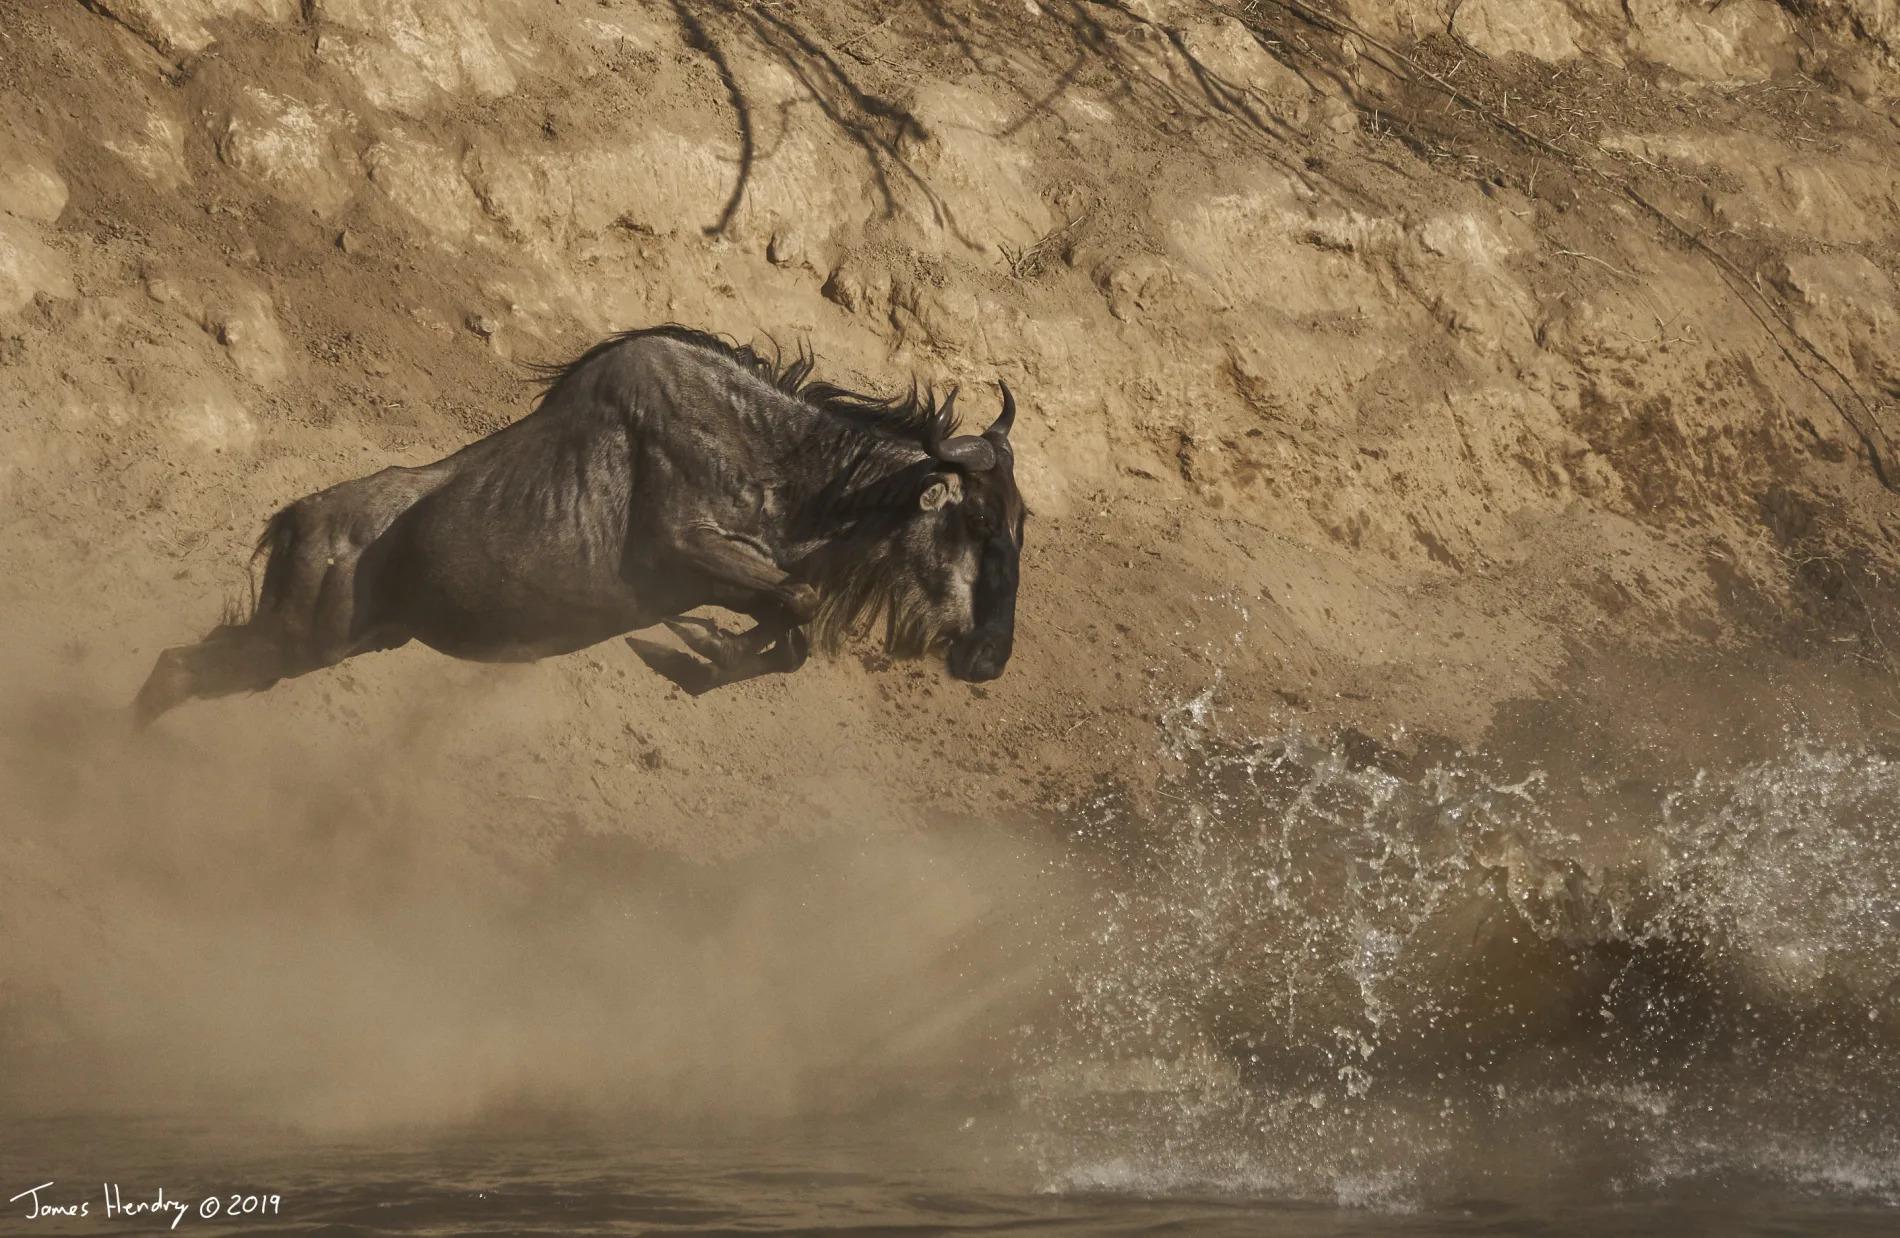 James Hendry_Lone wilde jump